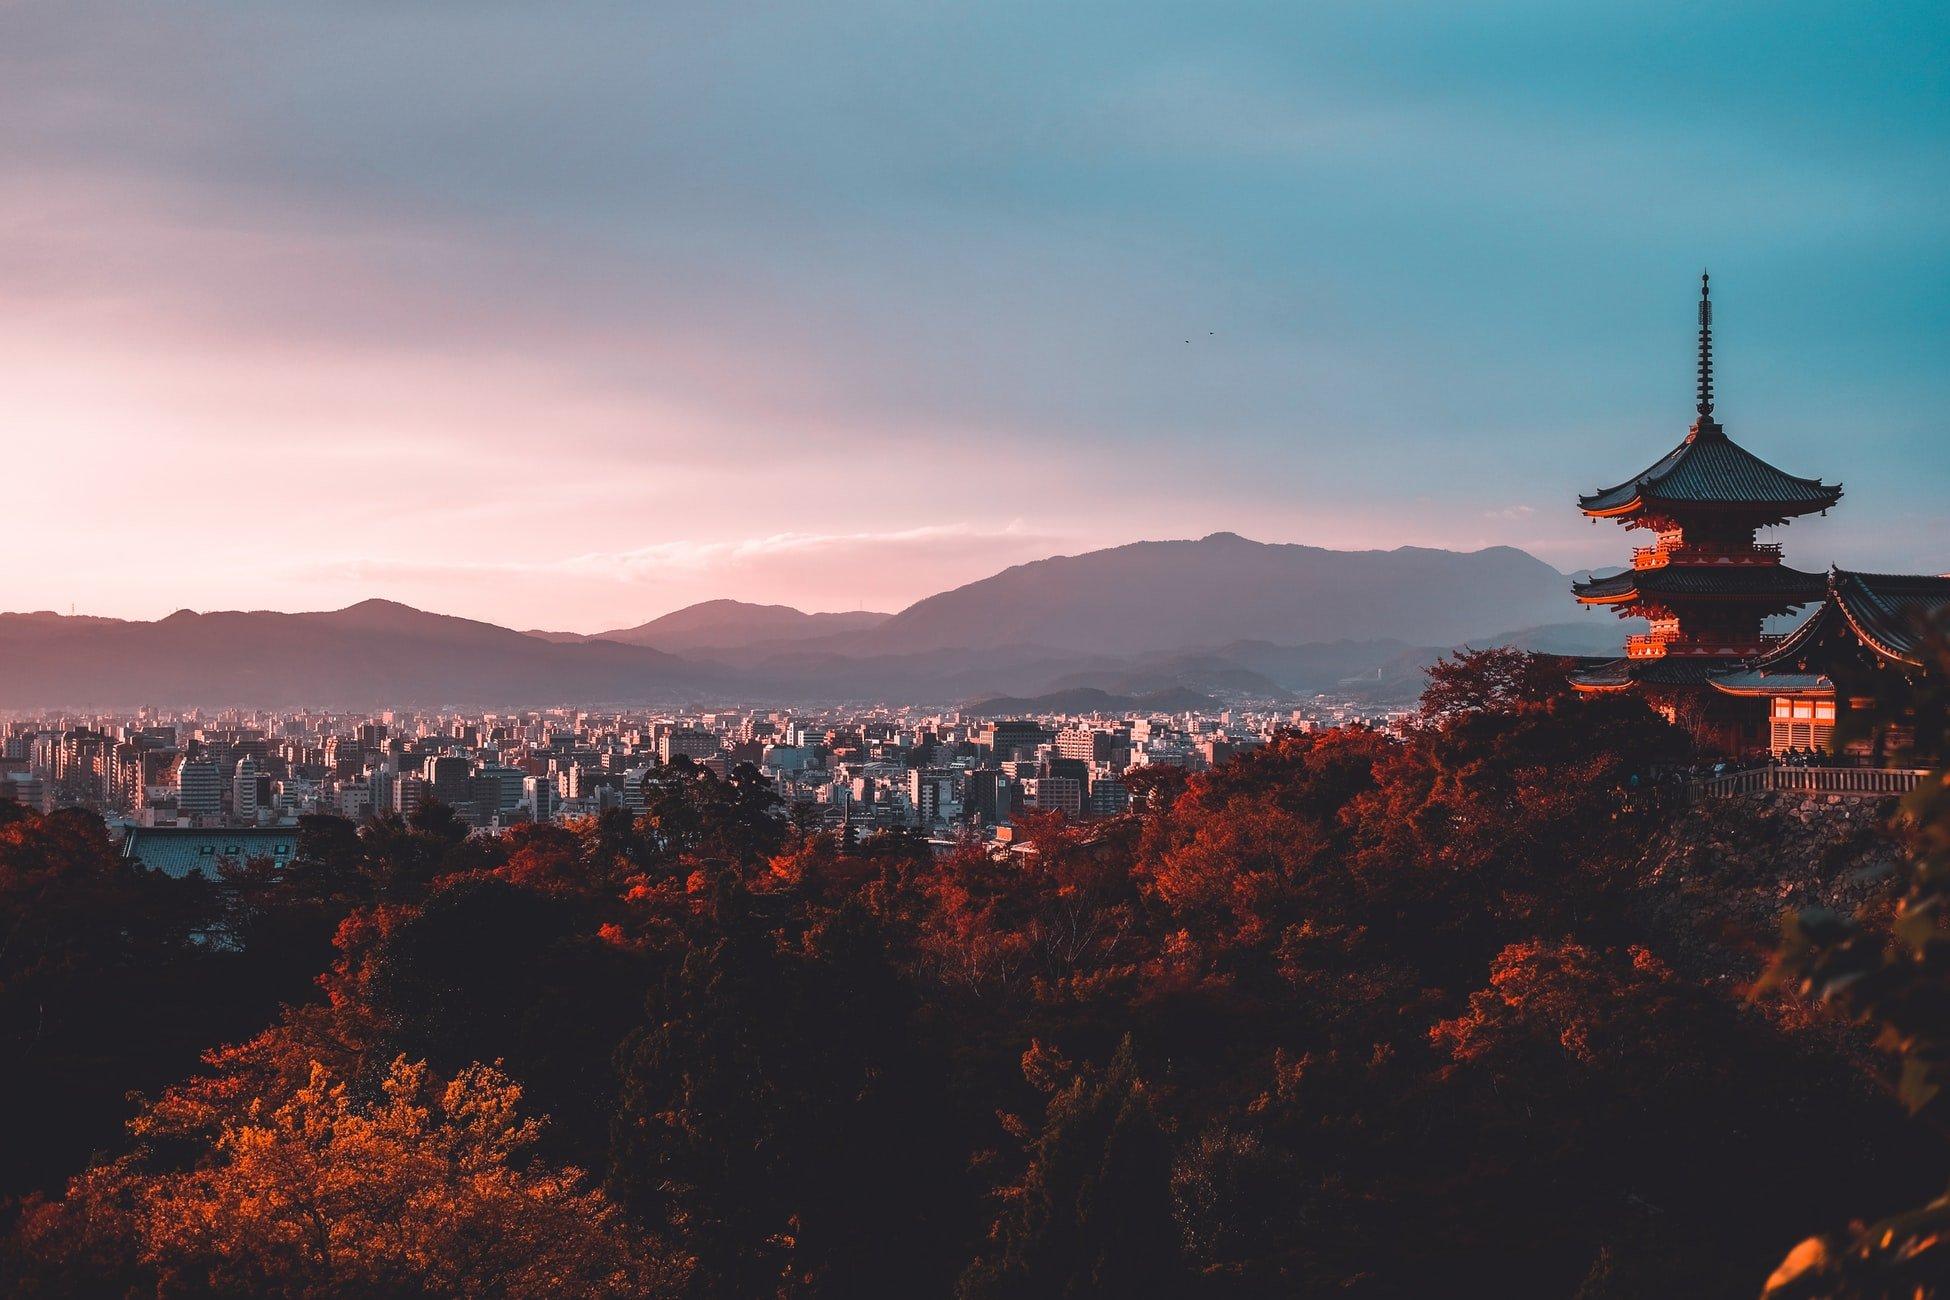 sunset photo of kyoto